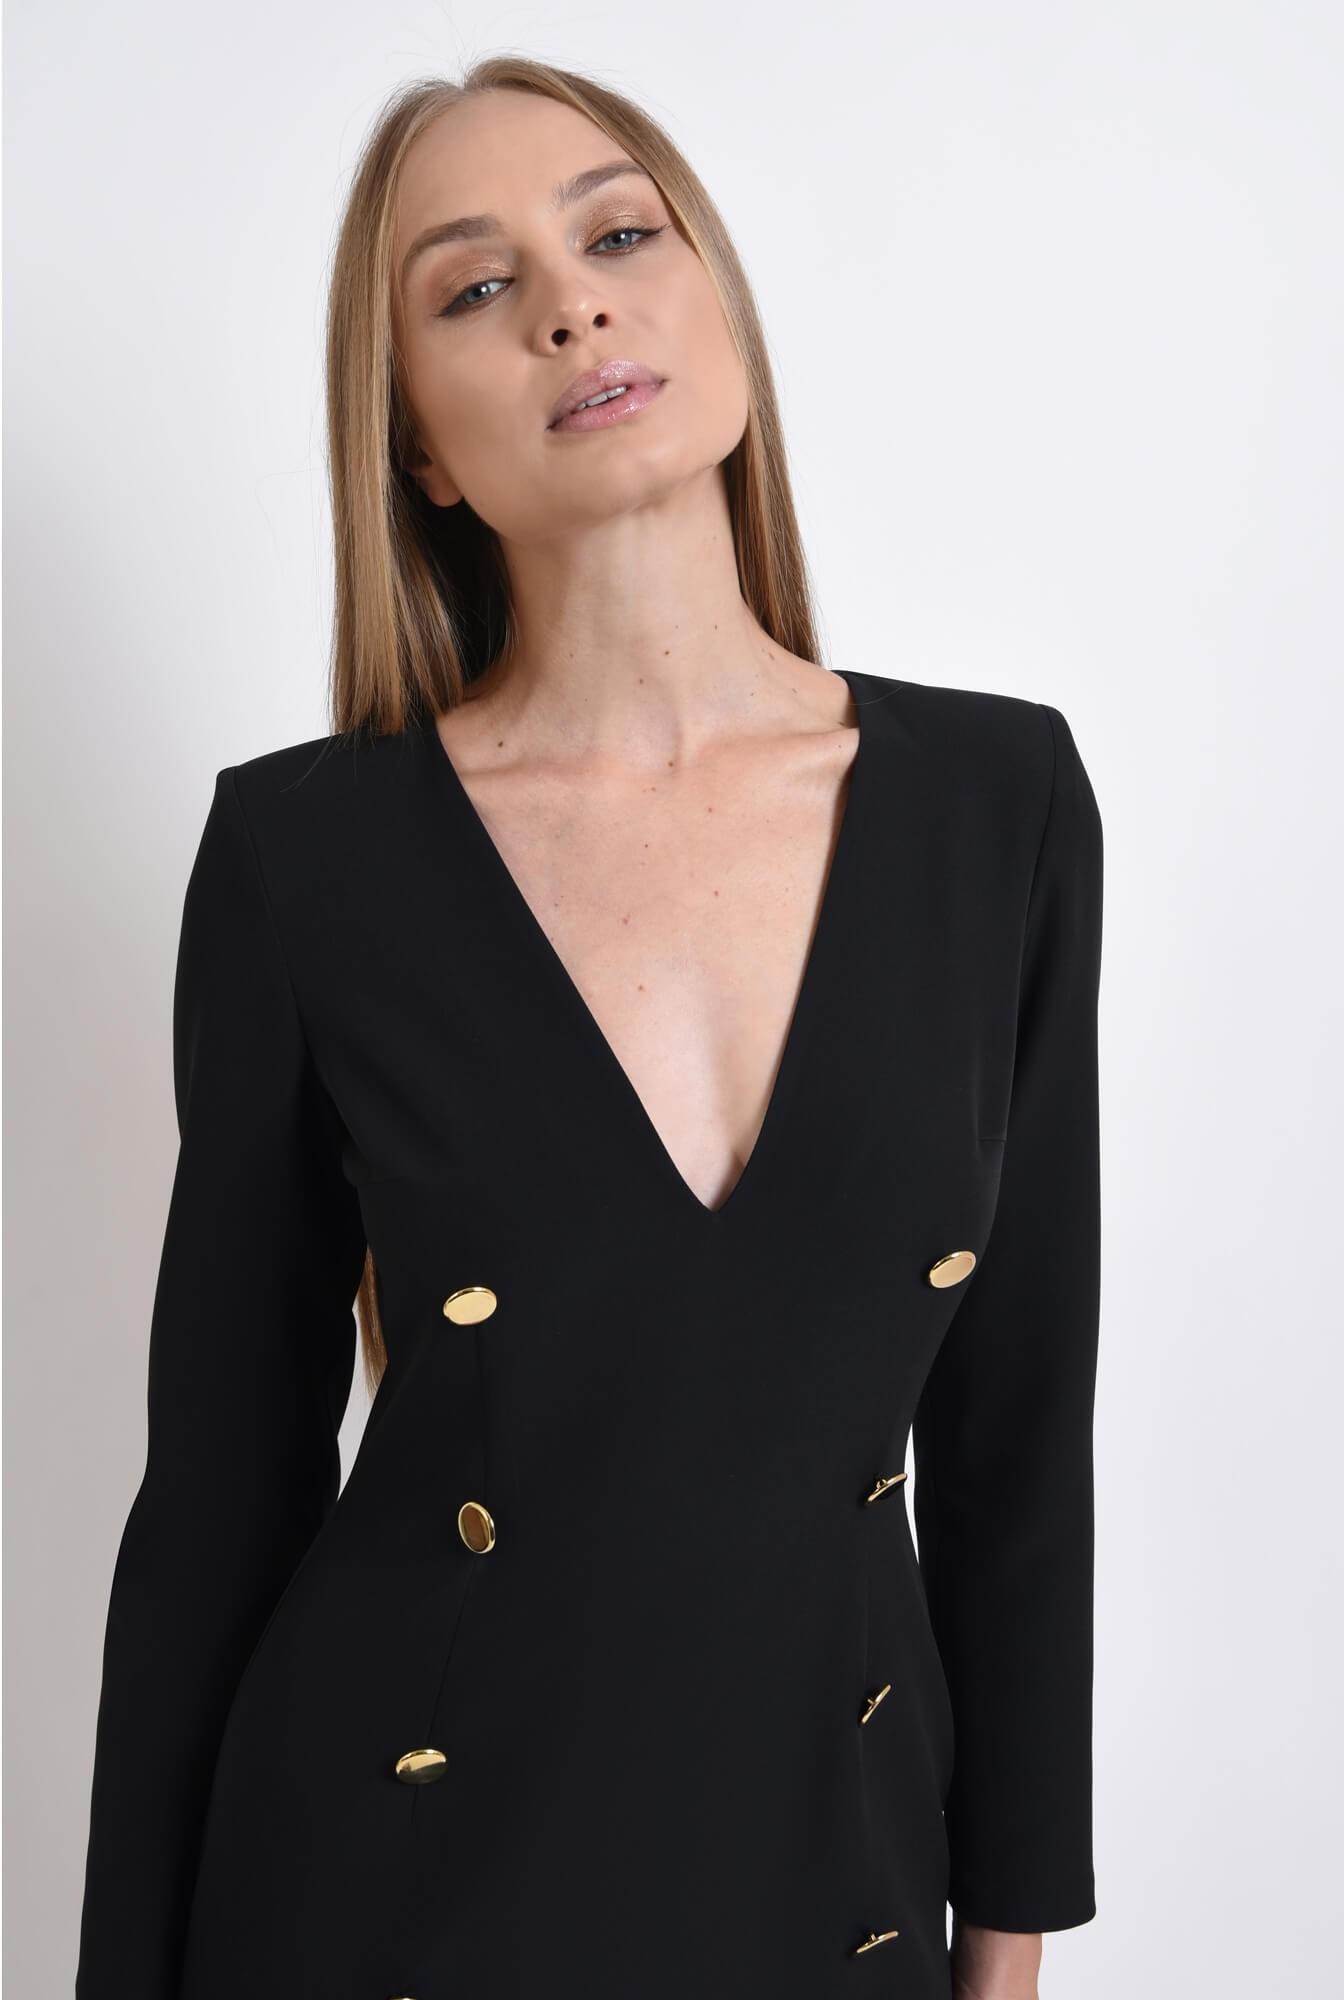 2 - rochie casual, neagra, cu nasturi multipli